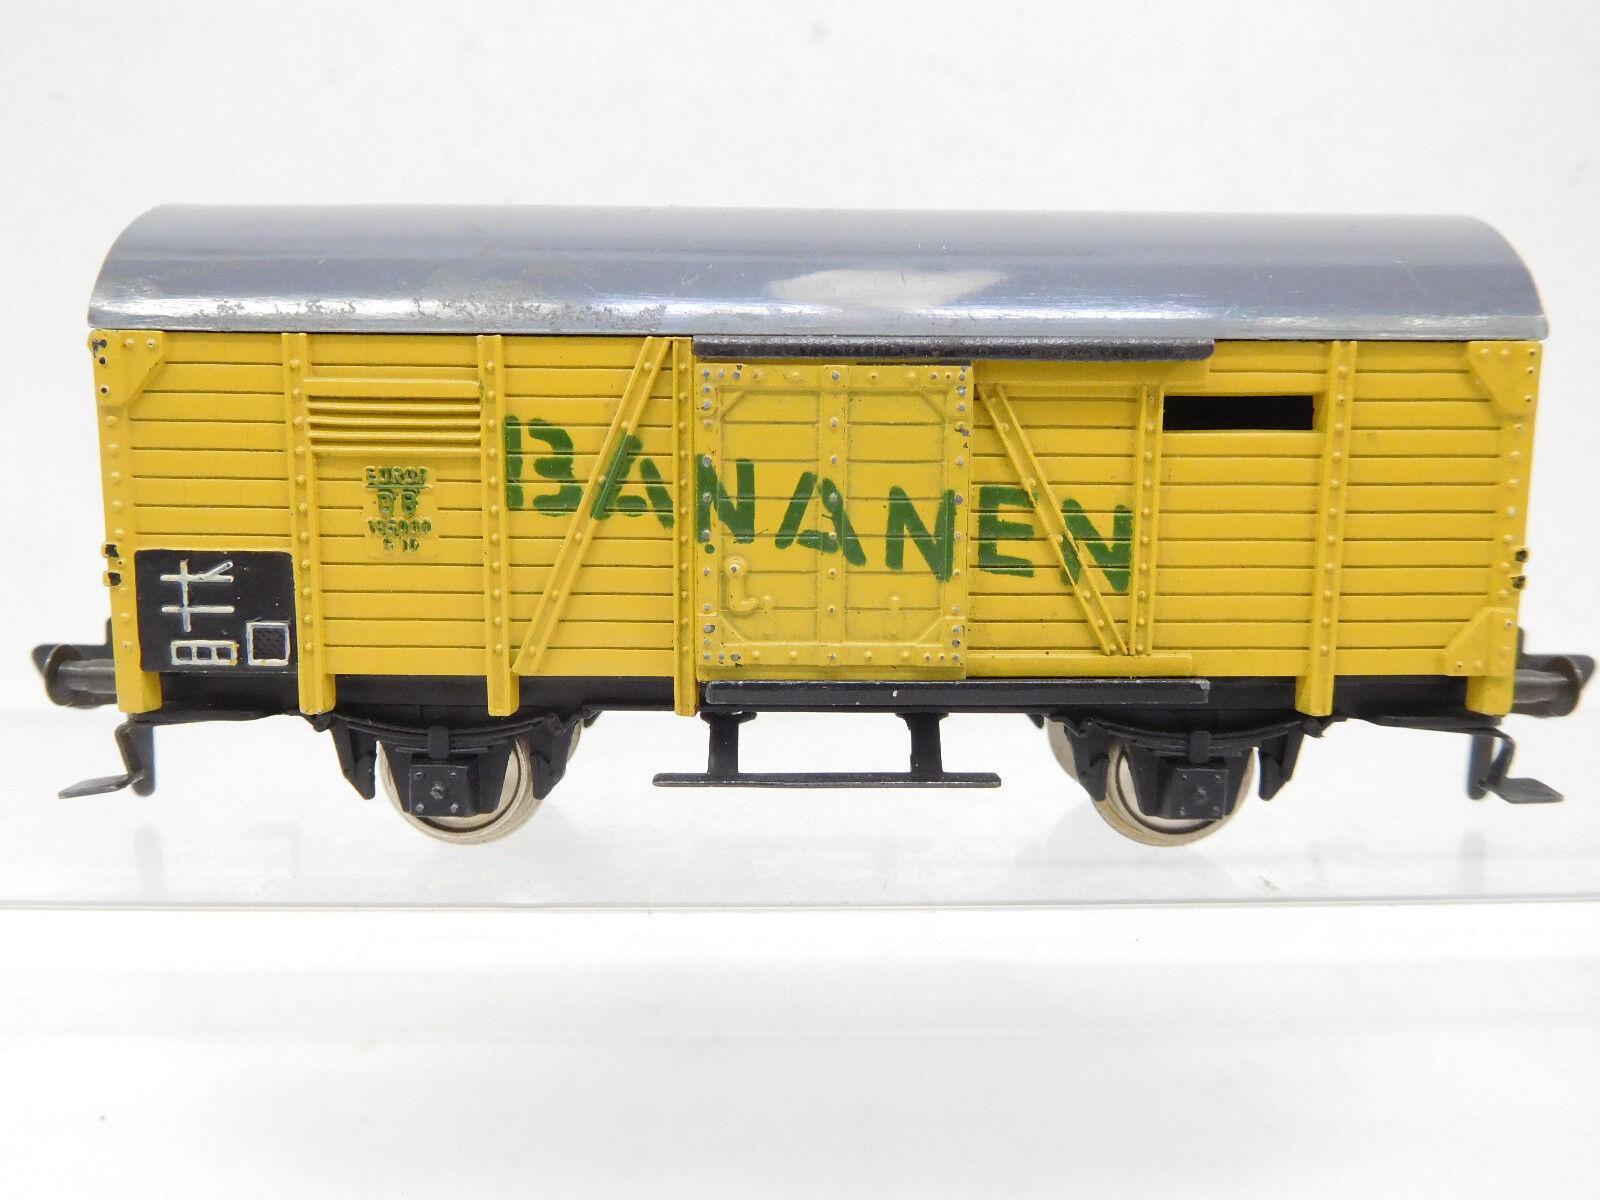 Mes-52949 Fleischmann 1463 h0 carro merci DB banane con lievi segni di usura,